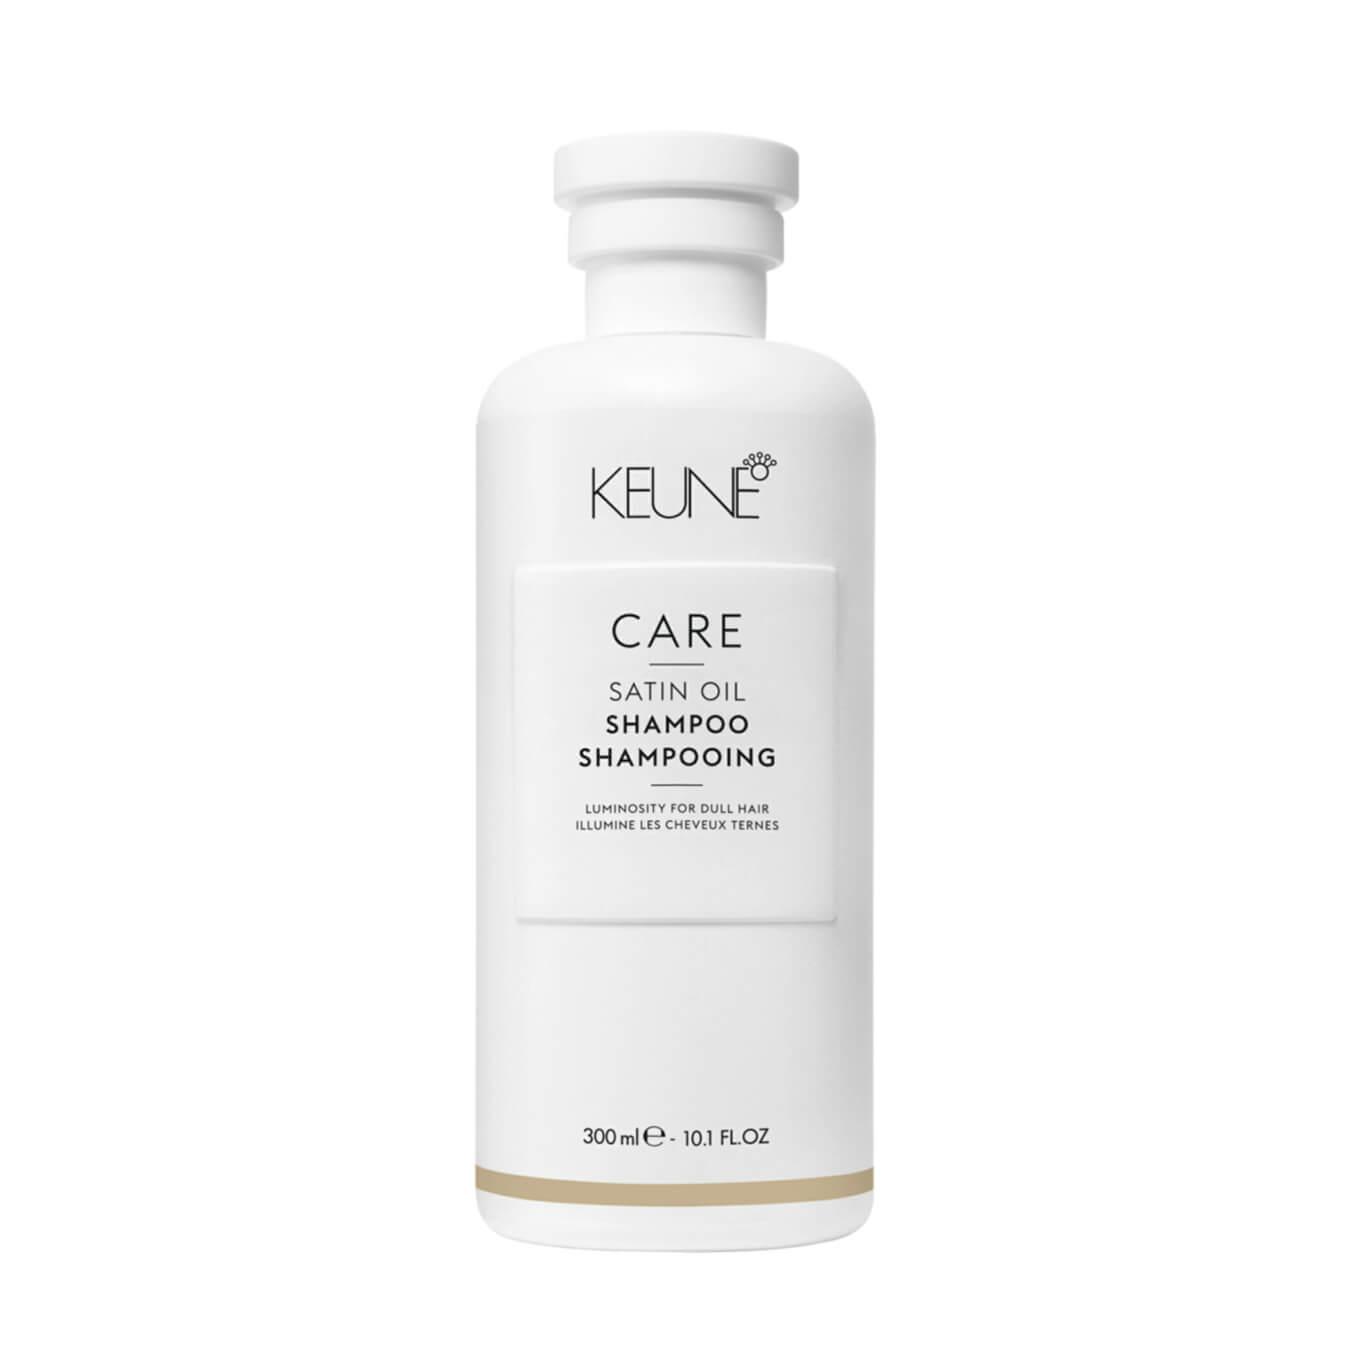 Kauf Keune Care Satin Oil Shampoo 300ml